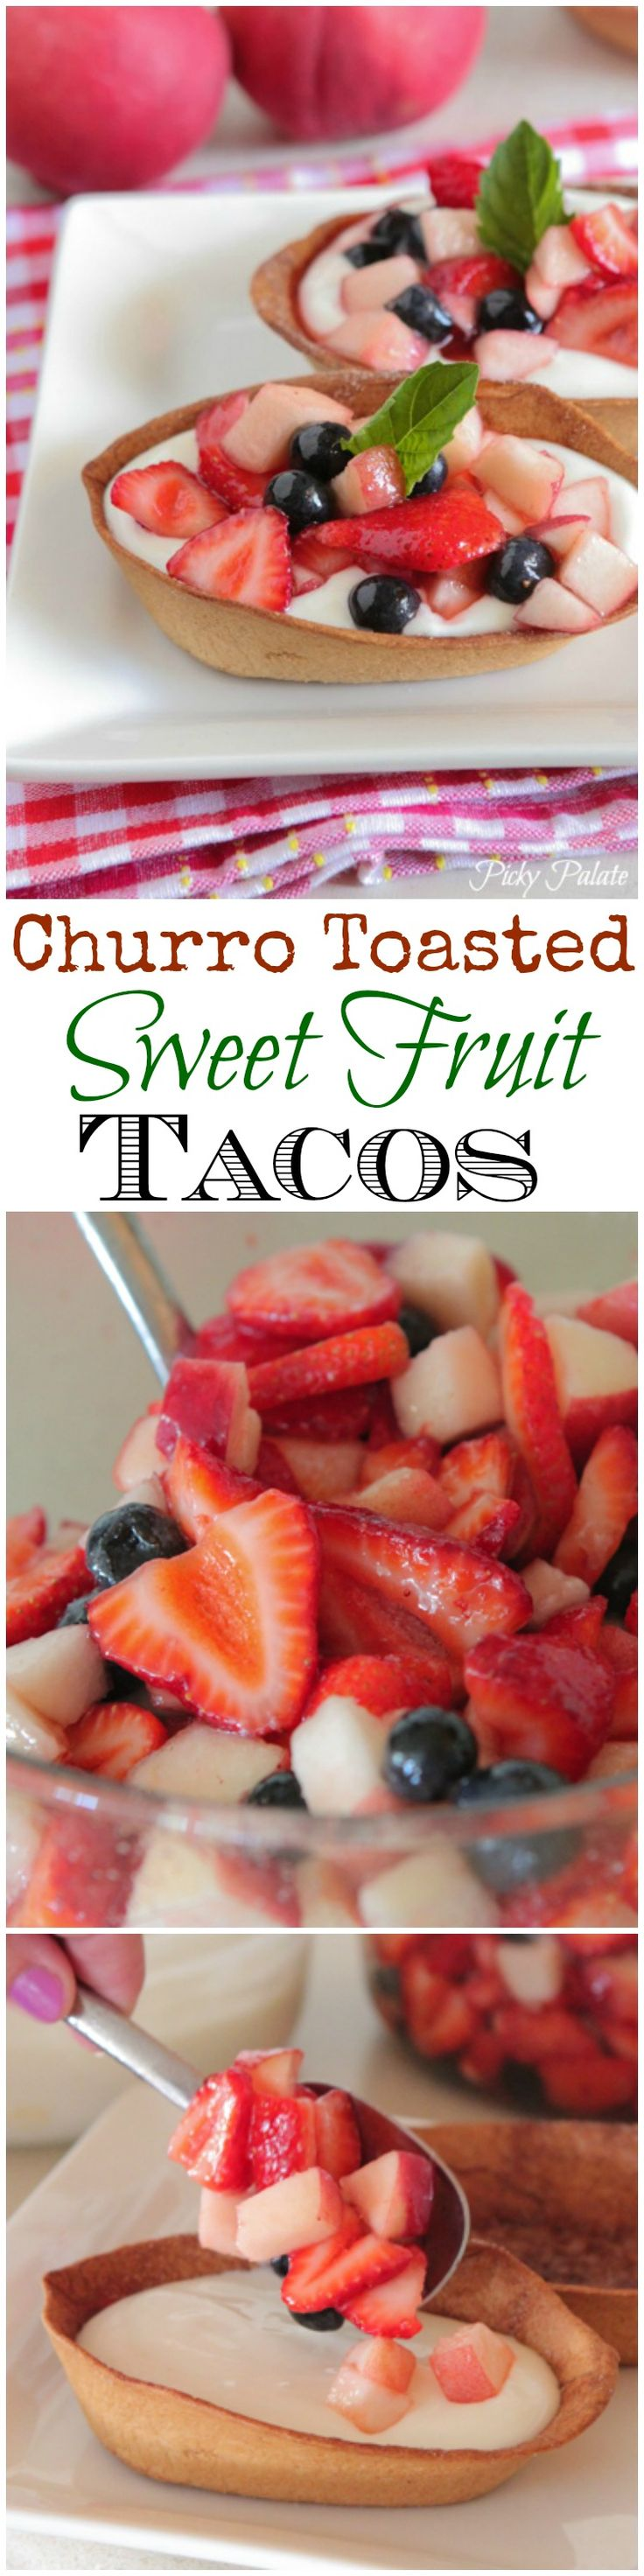 Churro Toasted Sweet Fruit Tacos!  Fun and light dessert idea :) #dessert #fruit